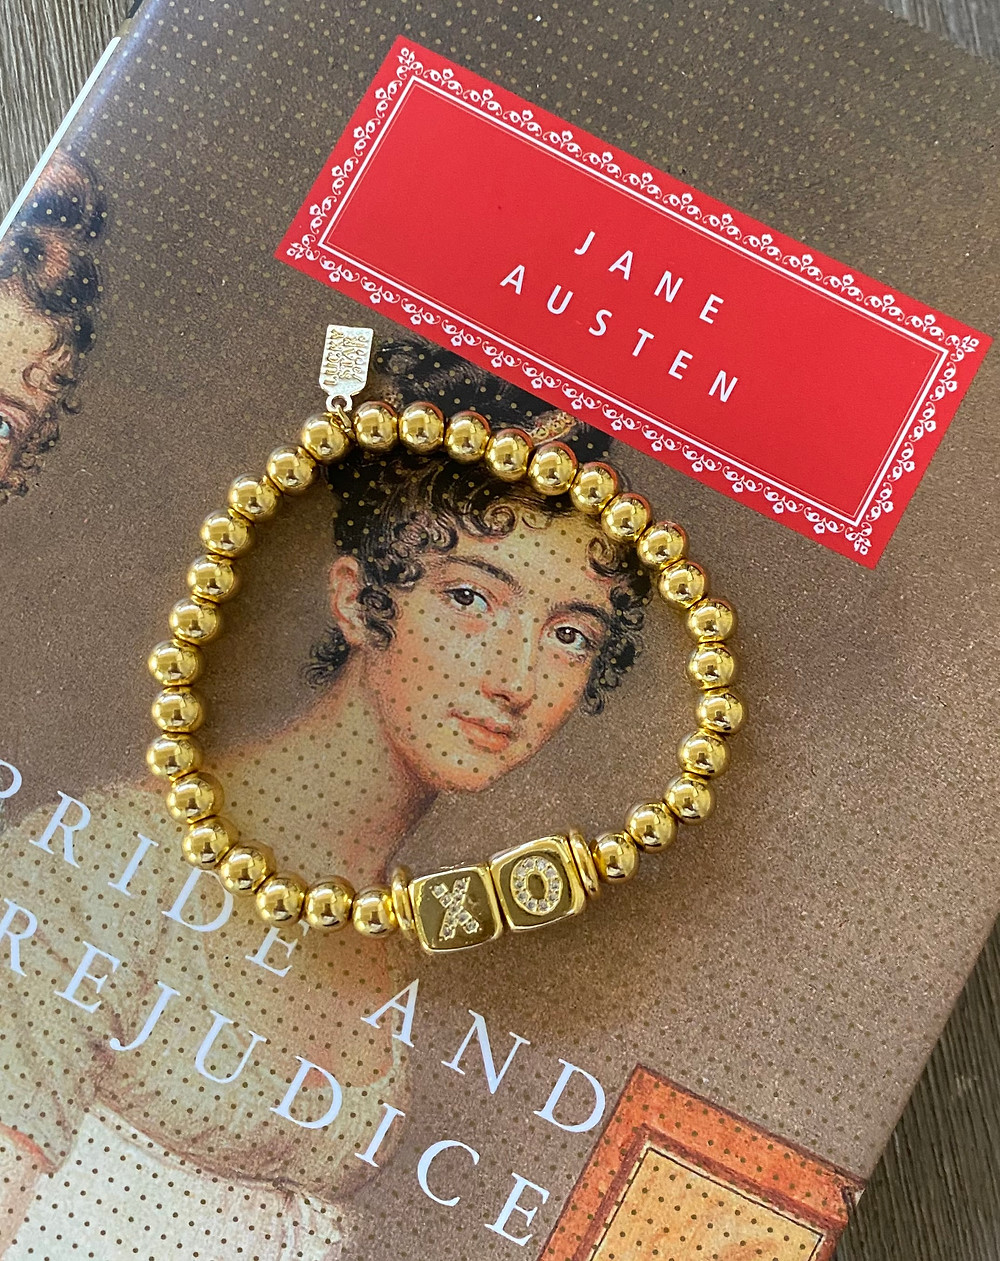 Best Jewelery 2021 - CZ ID Bracelet from Lucky Star Jewels   Yoga Fashion Self Care Blogger